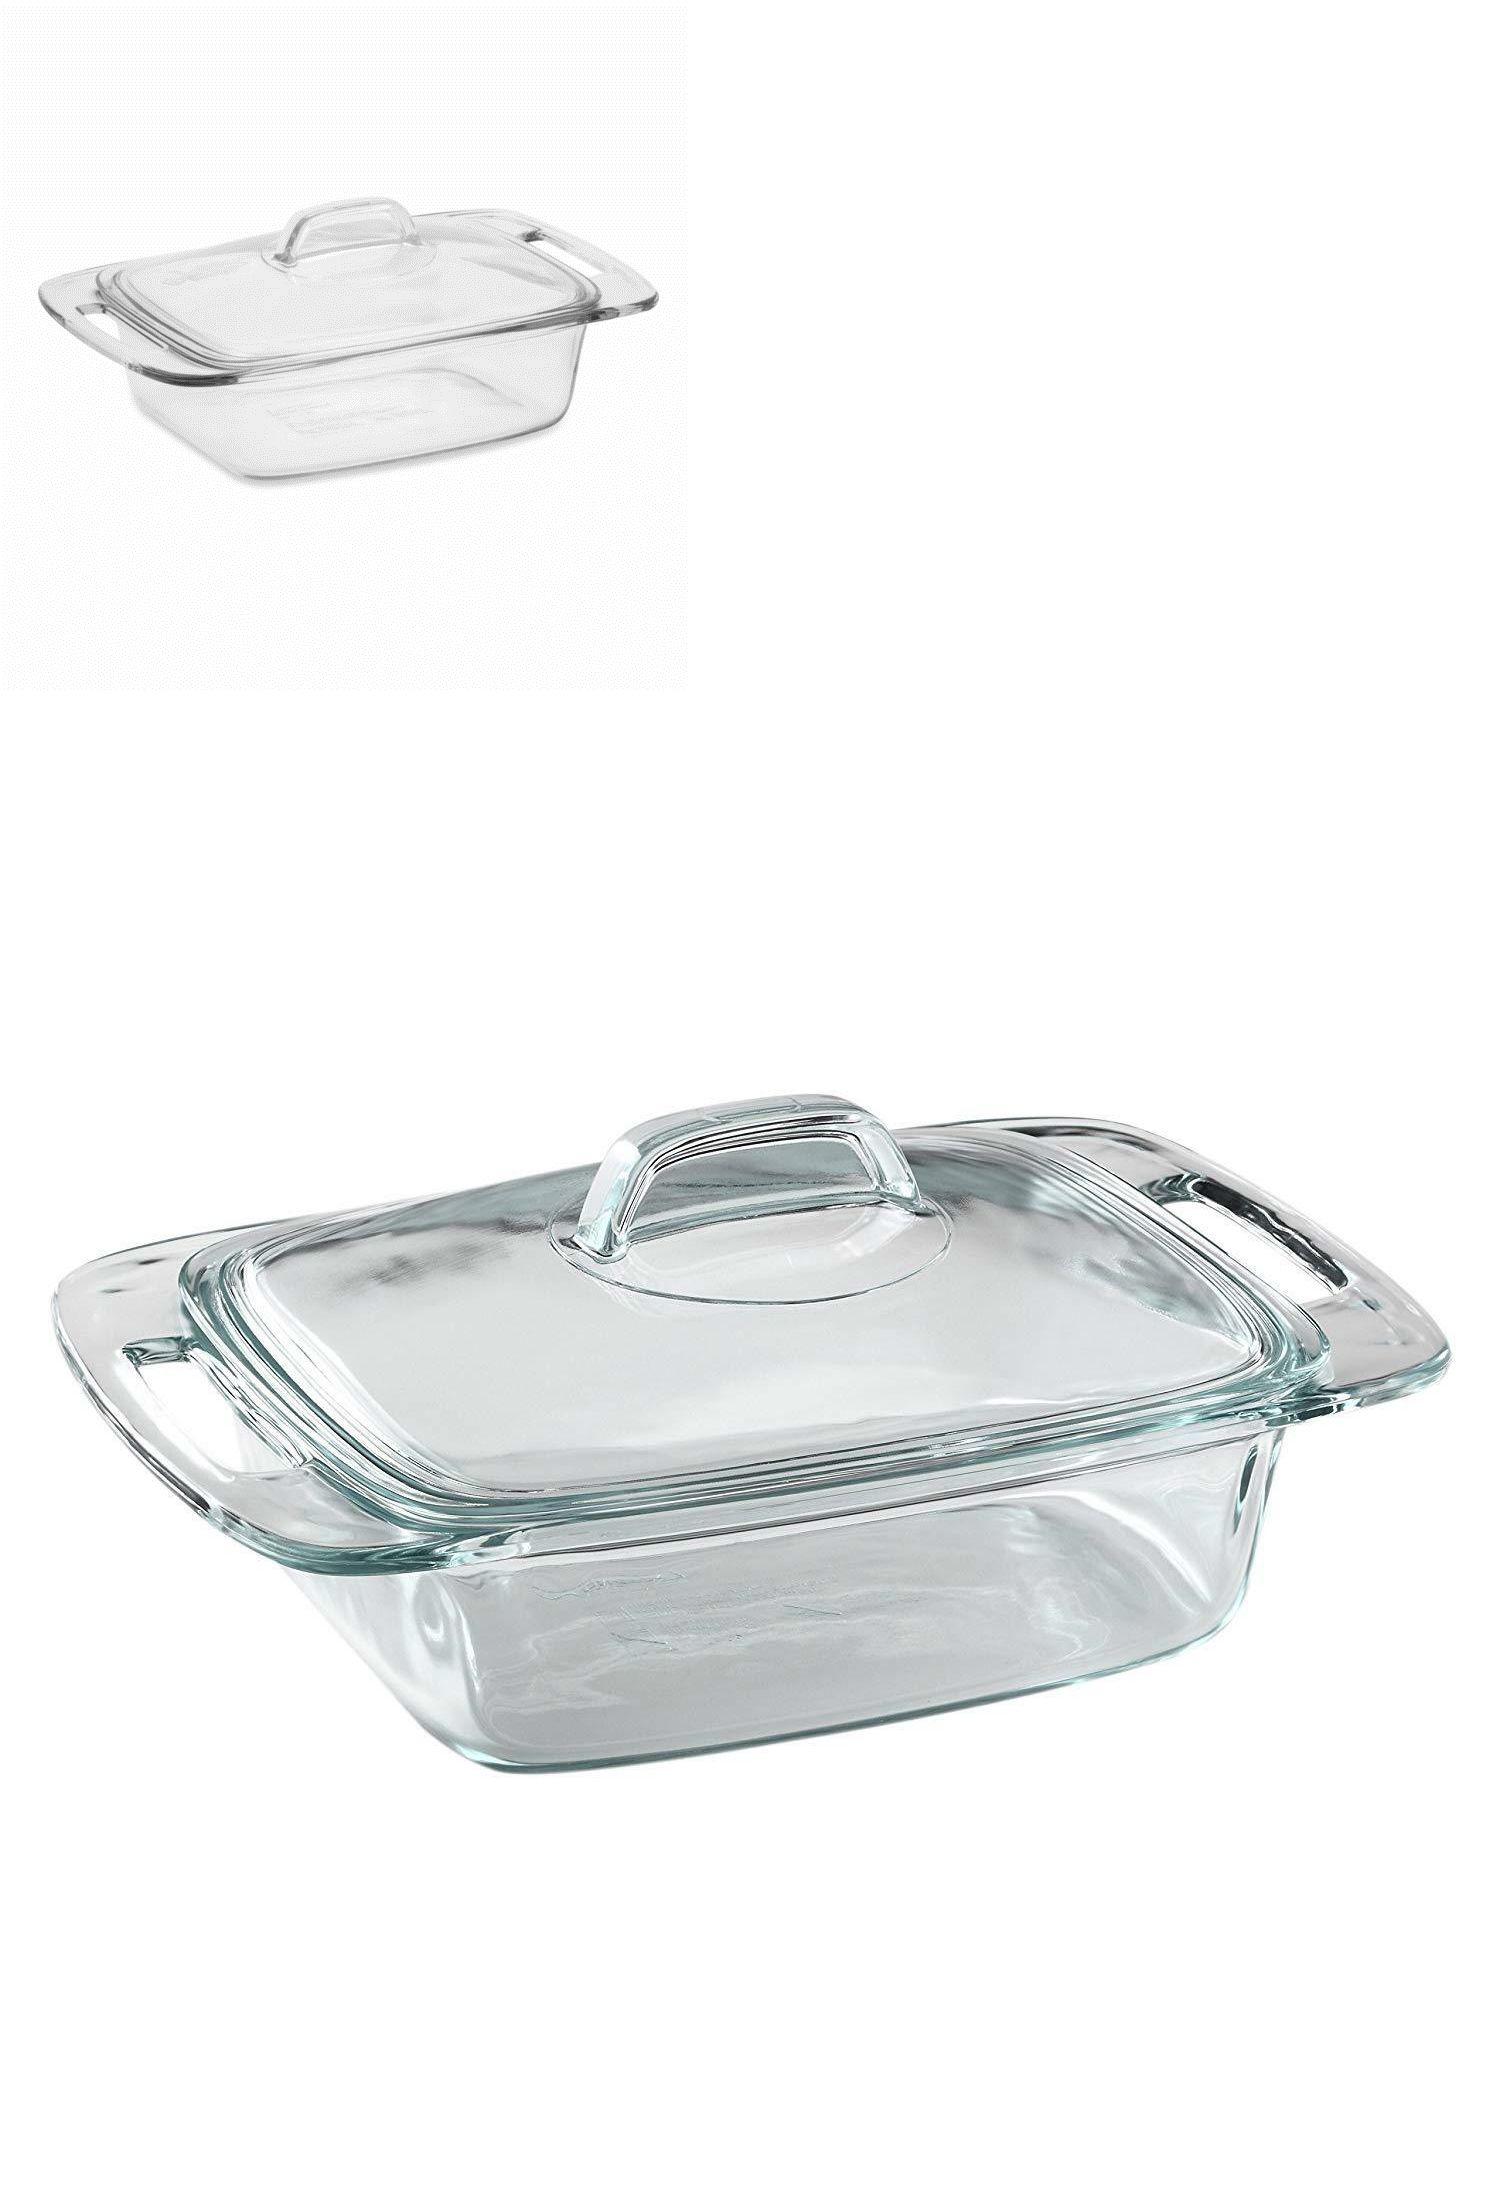 Bakeware 25464 Pyrex 2 Quart Casserole Glass Bakeware Dish With